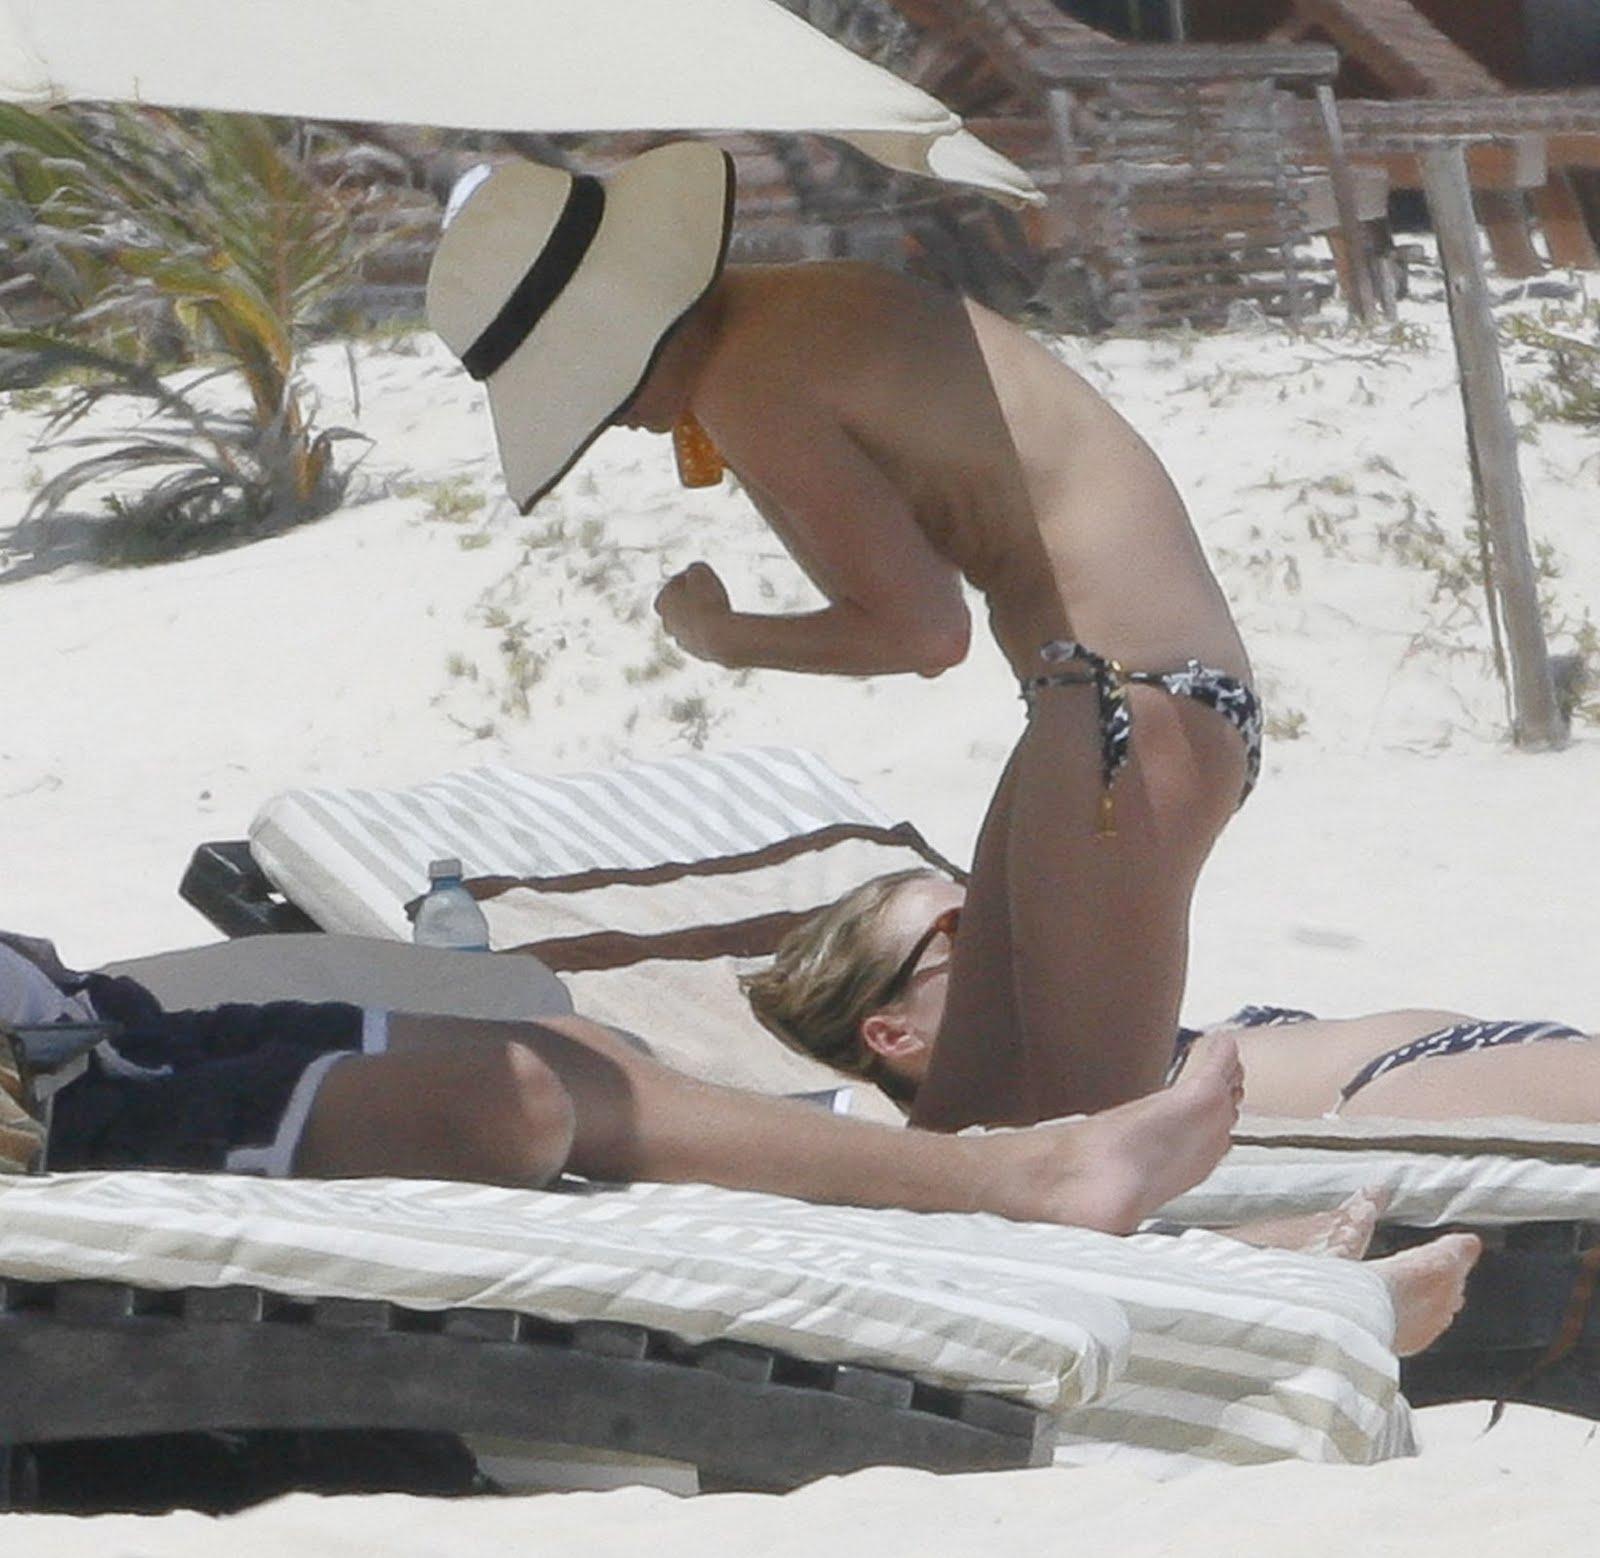 http://1.bp.blogspot.com/-Ql3e00x2KWE/T1sXnP6LQrI/AAAAAAAABNY/3hUstbSmlbg/s1600/Kate+Bosworth+Topless+Bikini+Candids+At+The+Beach+www.Eyeho.com+008.jpg